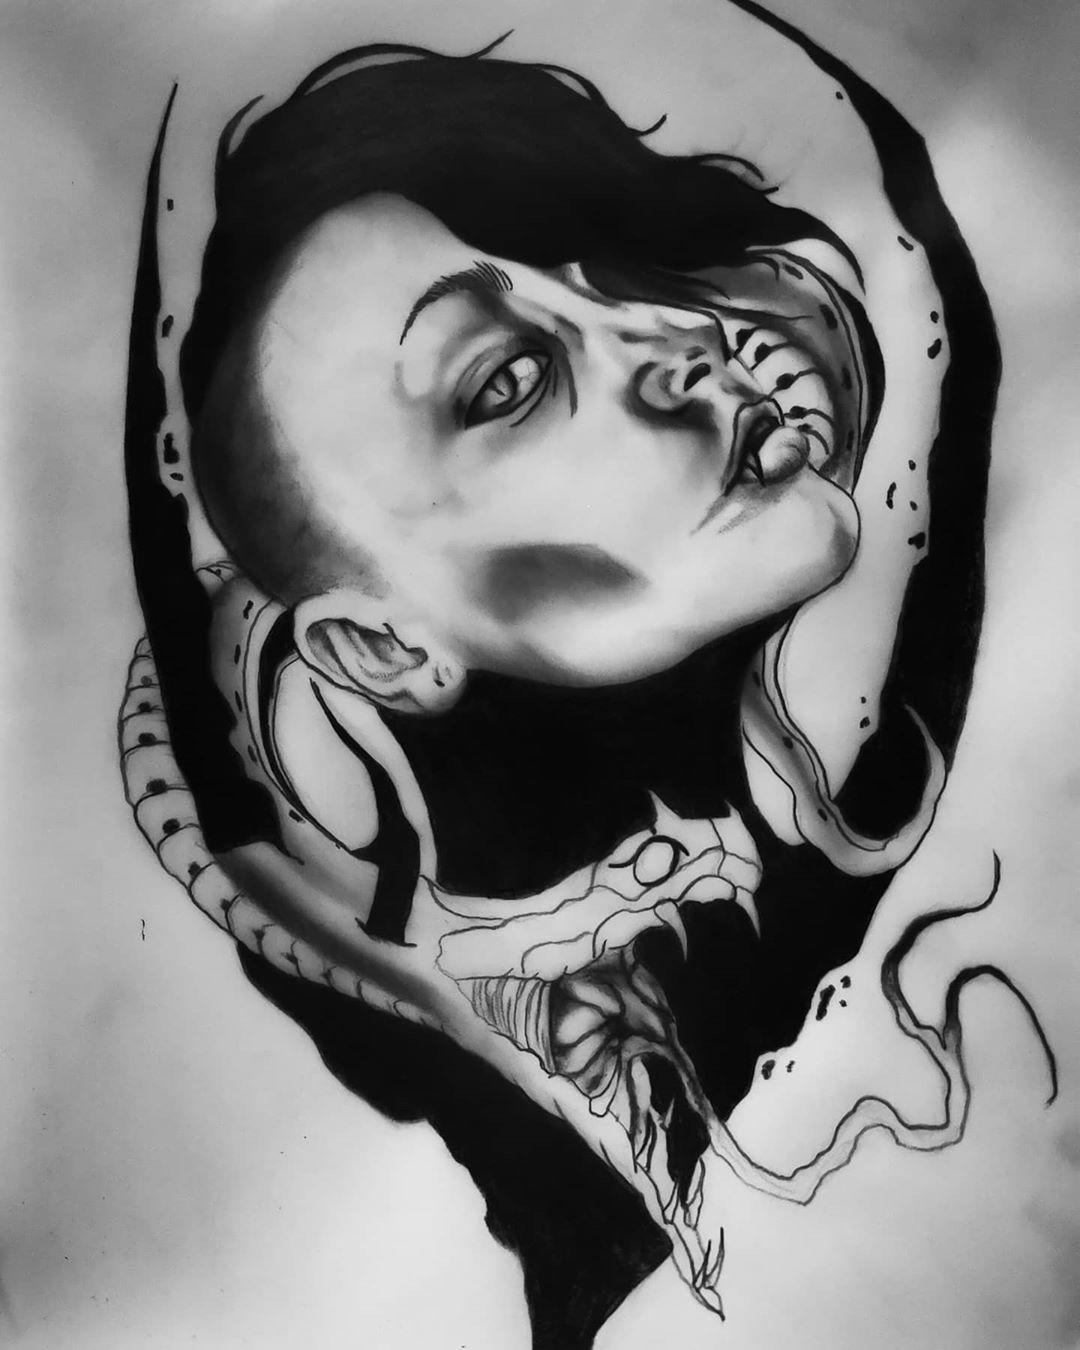 Viper ⬛☢️ . . . #black #blackwork #blackworker #blackworktattoo #blacktattooart #bl4ck #onlyblackwork #moreblack #moreblackink #blxckink #blxckwork #blkttt #arteobscurae #dark #onlythedarkest #darkworld #taot #tattooartist #tttism #inkmagazine #blacktattoo #artofdarkness ⬛☢️